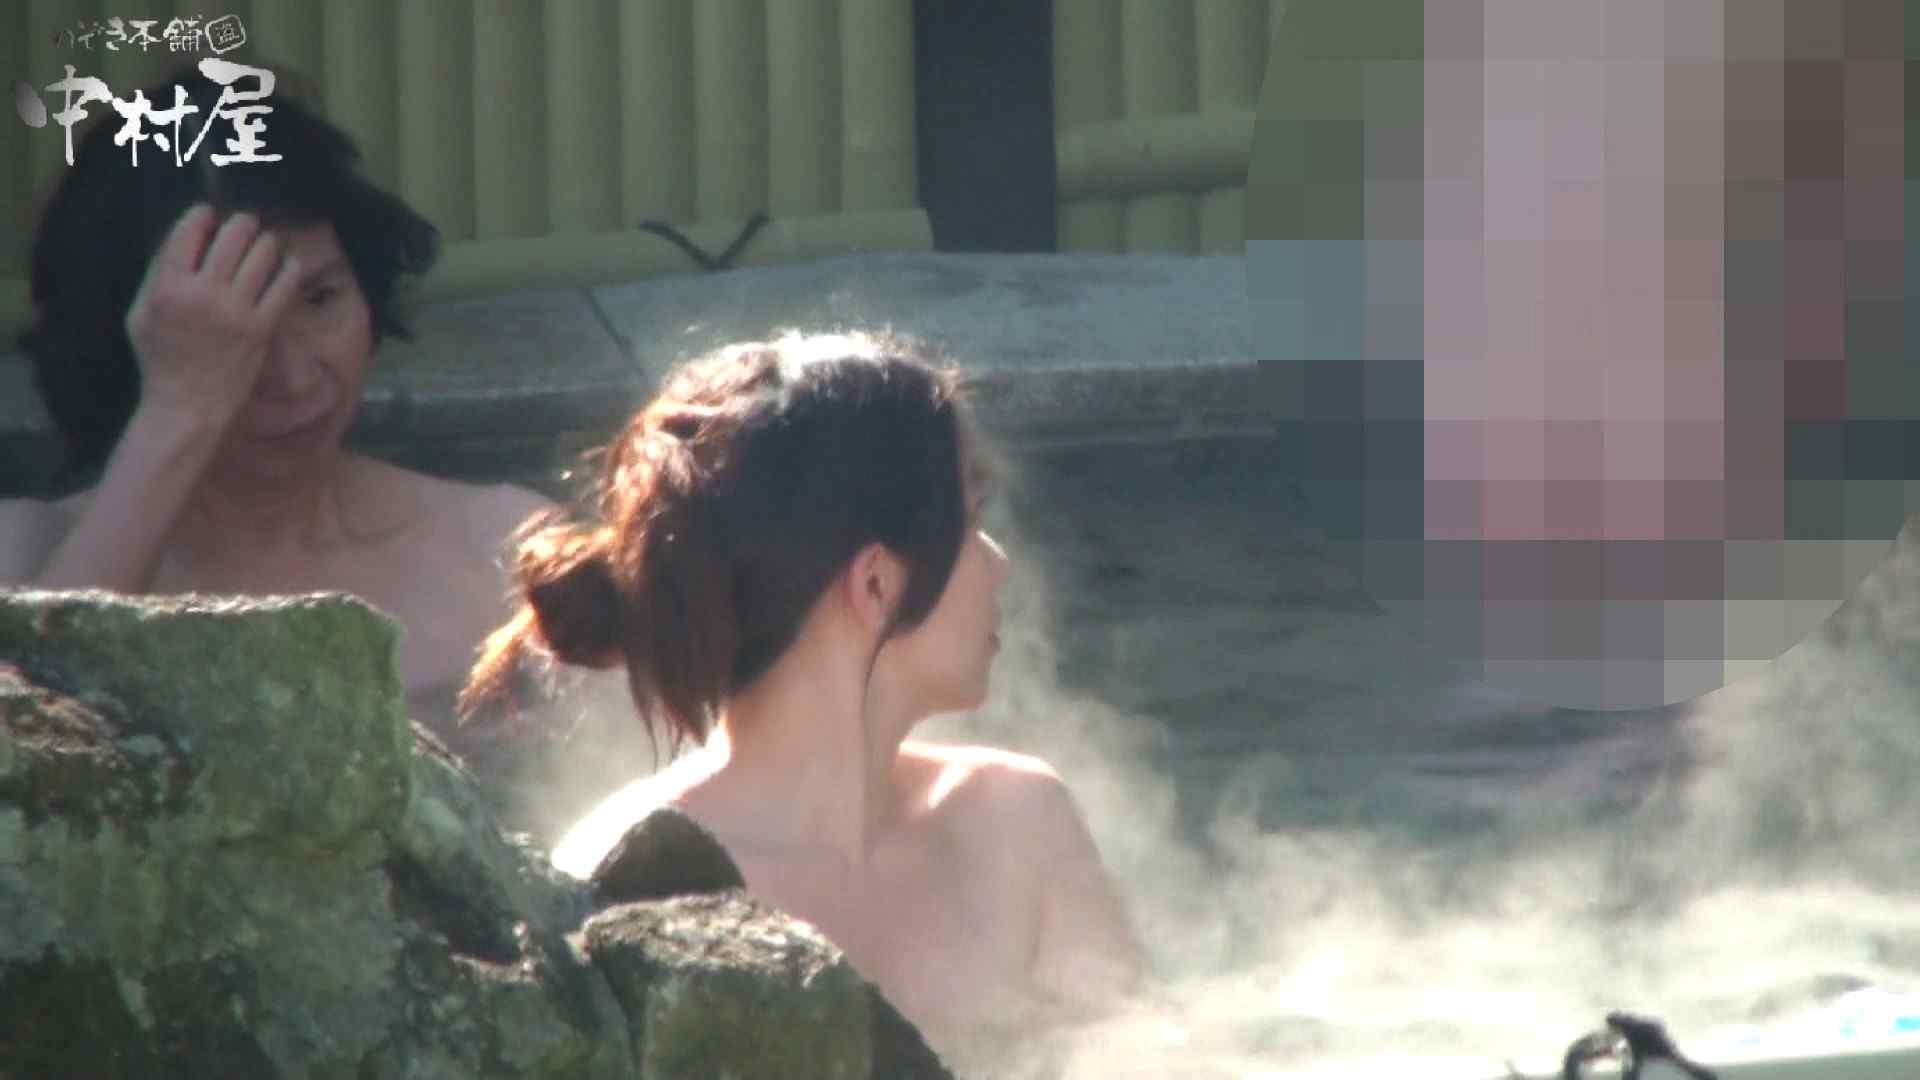 Aquaな露天風呂Vol.919 盗撮 おまんこ無修正動画無料 91連発 47